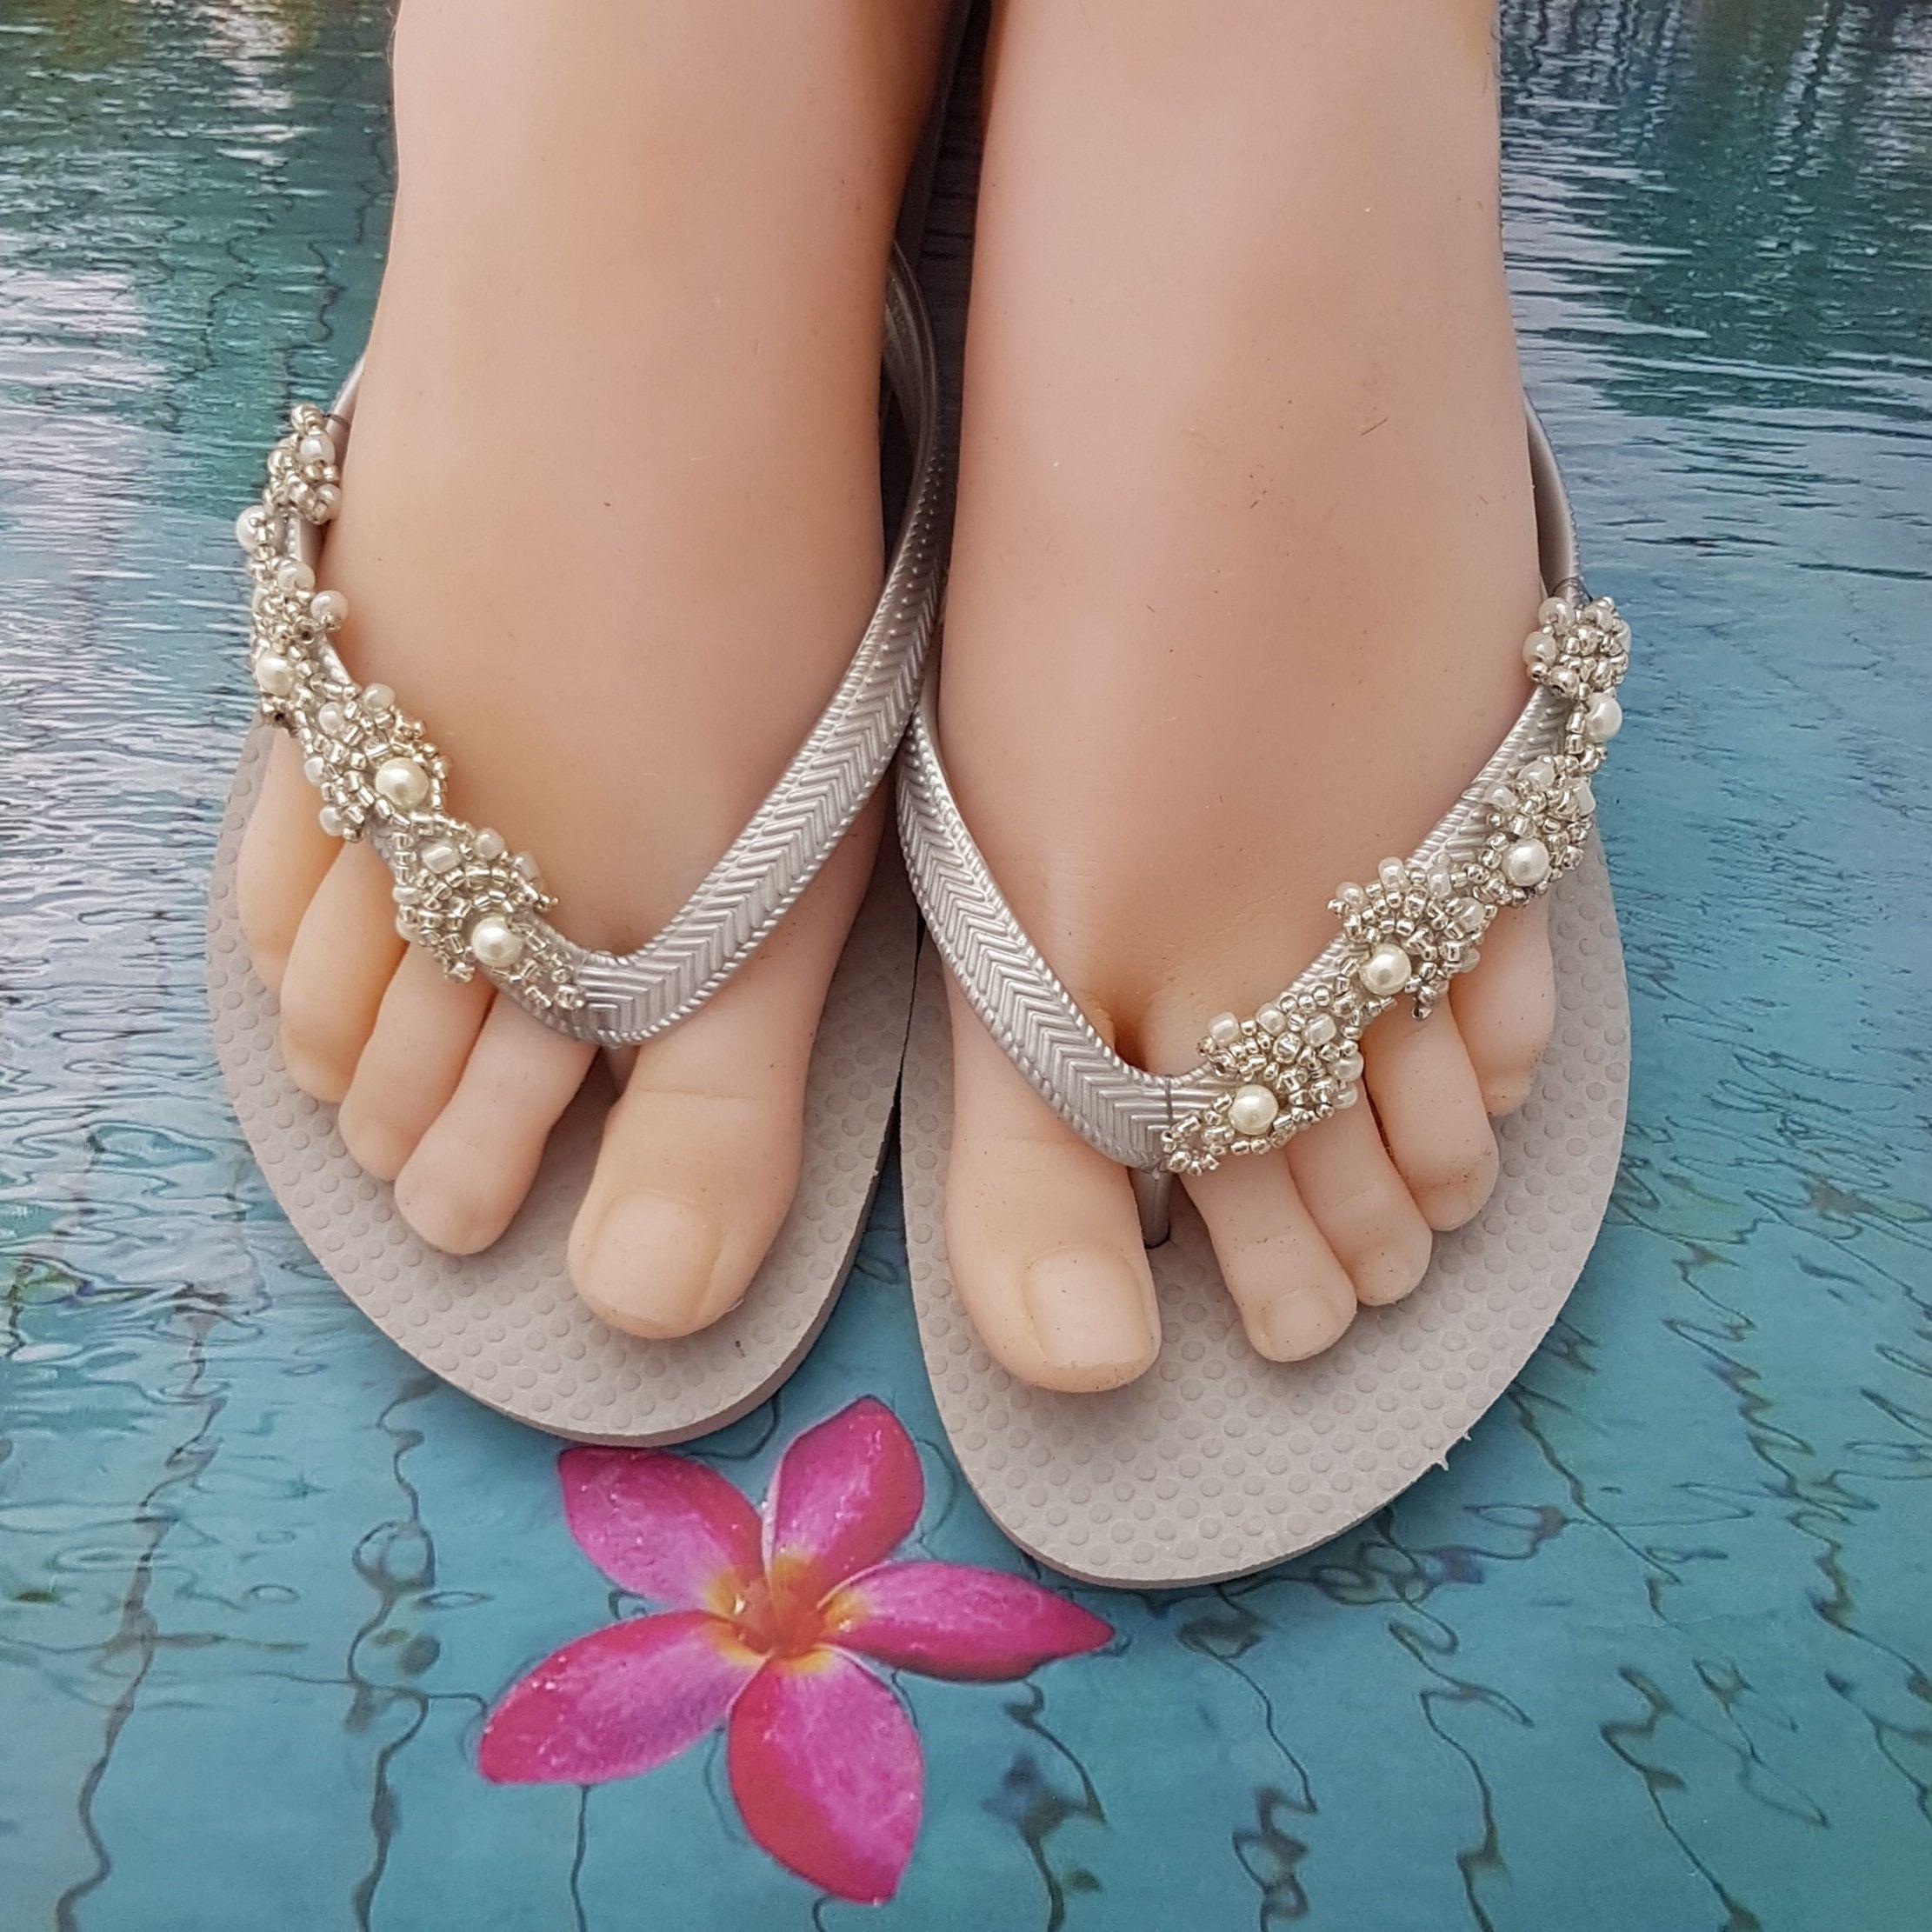 b8b56dfa14820 Flip Flops for Wedding Guests